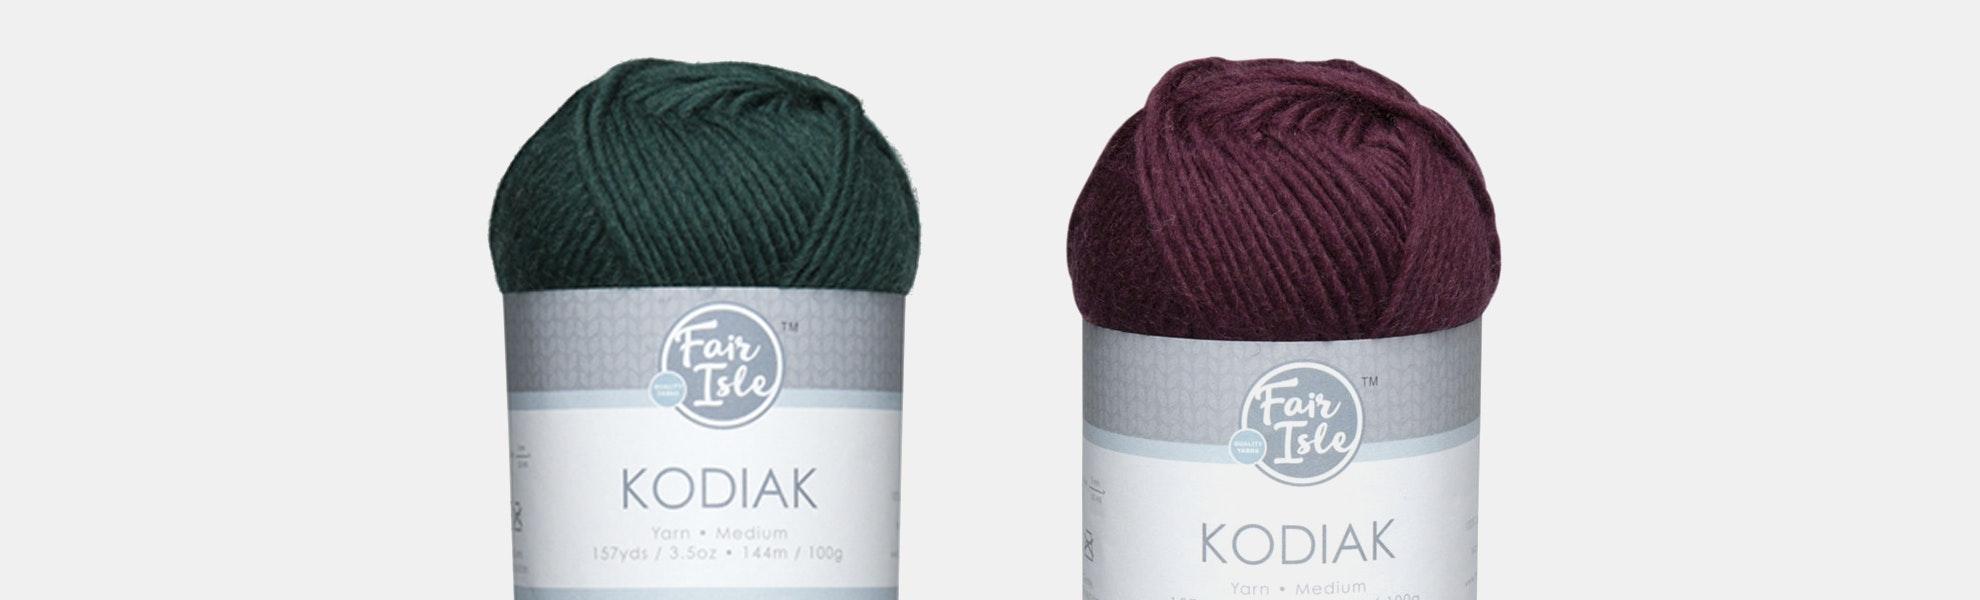 Kodiak Brights Yarn by Fair Isle (2-Pack)